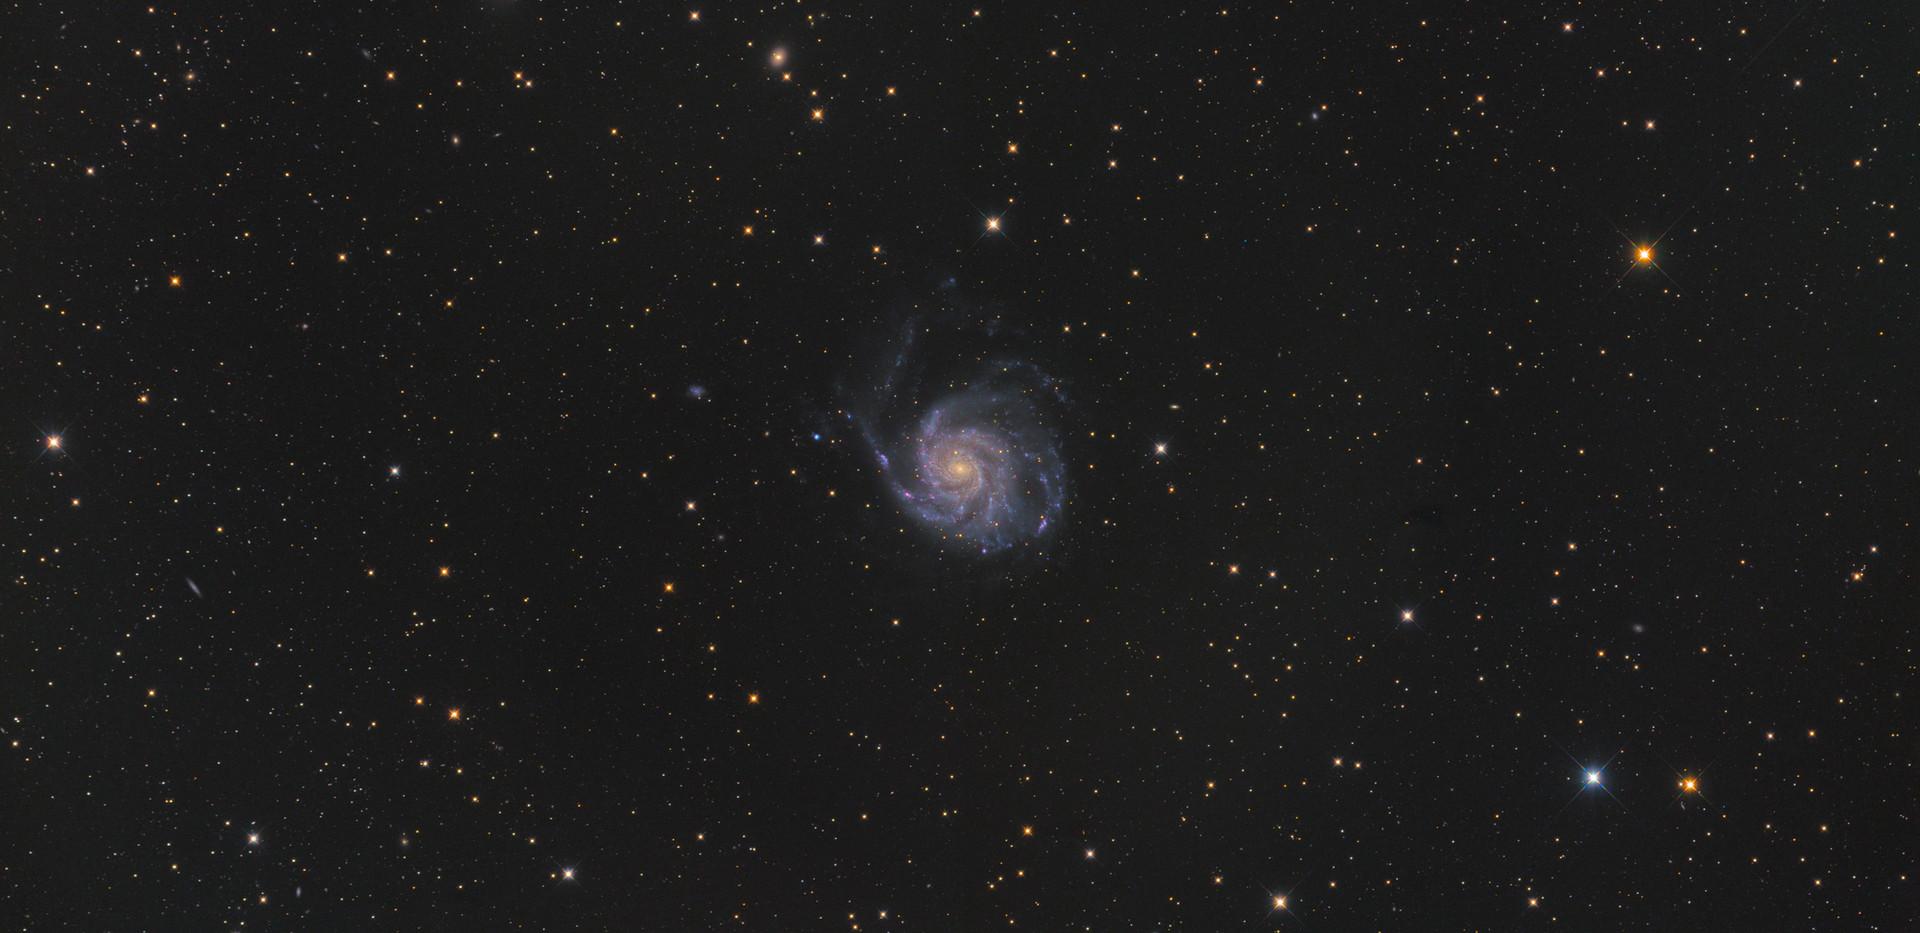 M101_20180322_FDK250-S001_CRUX250HDA_ML5